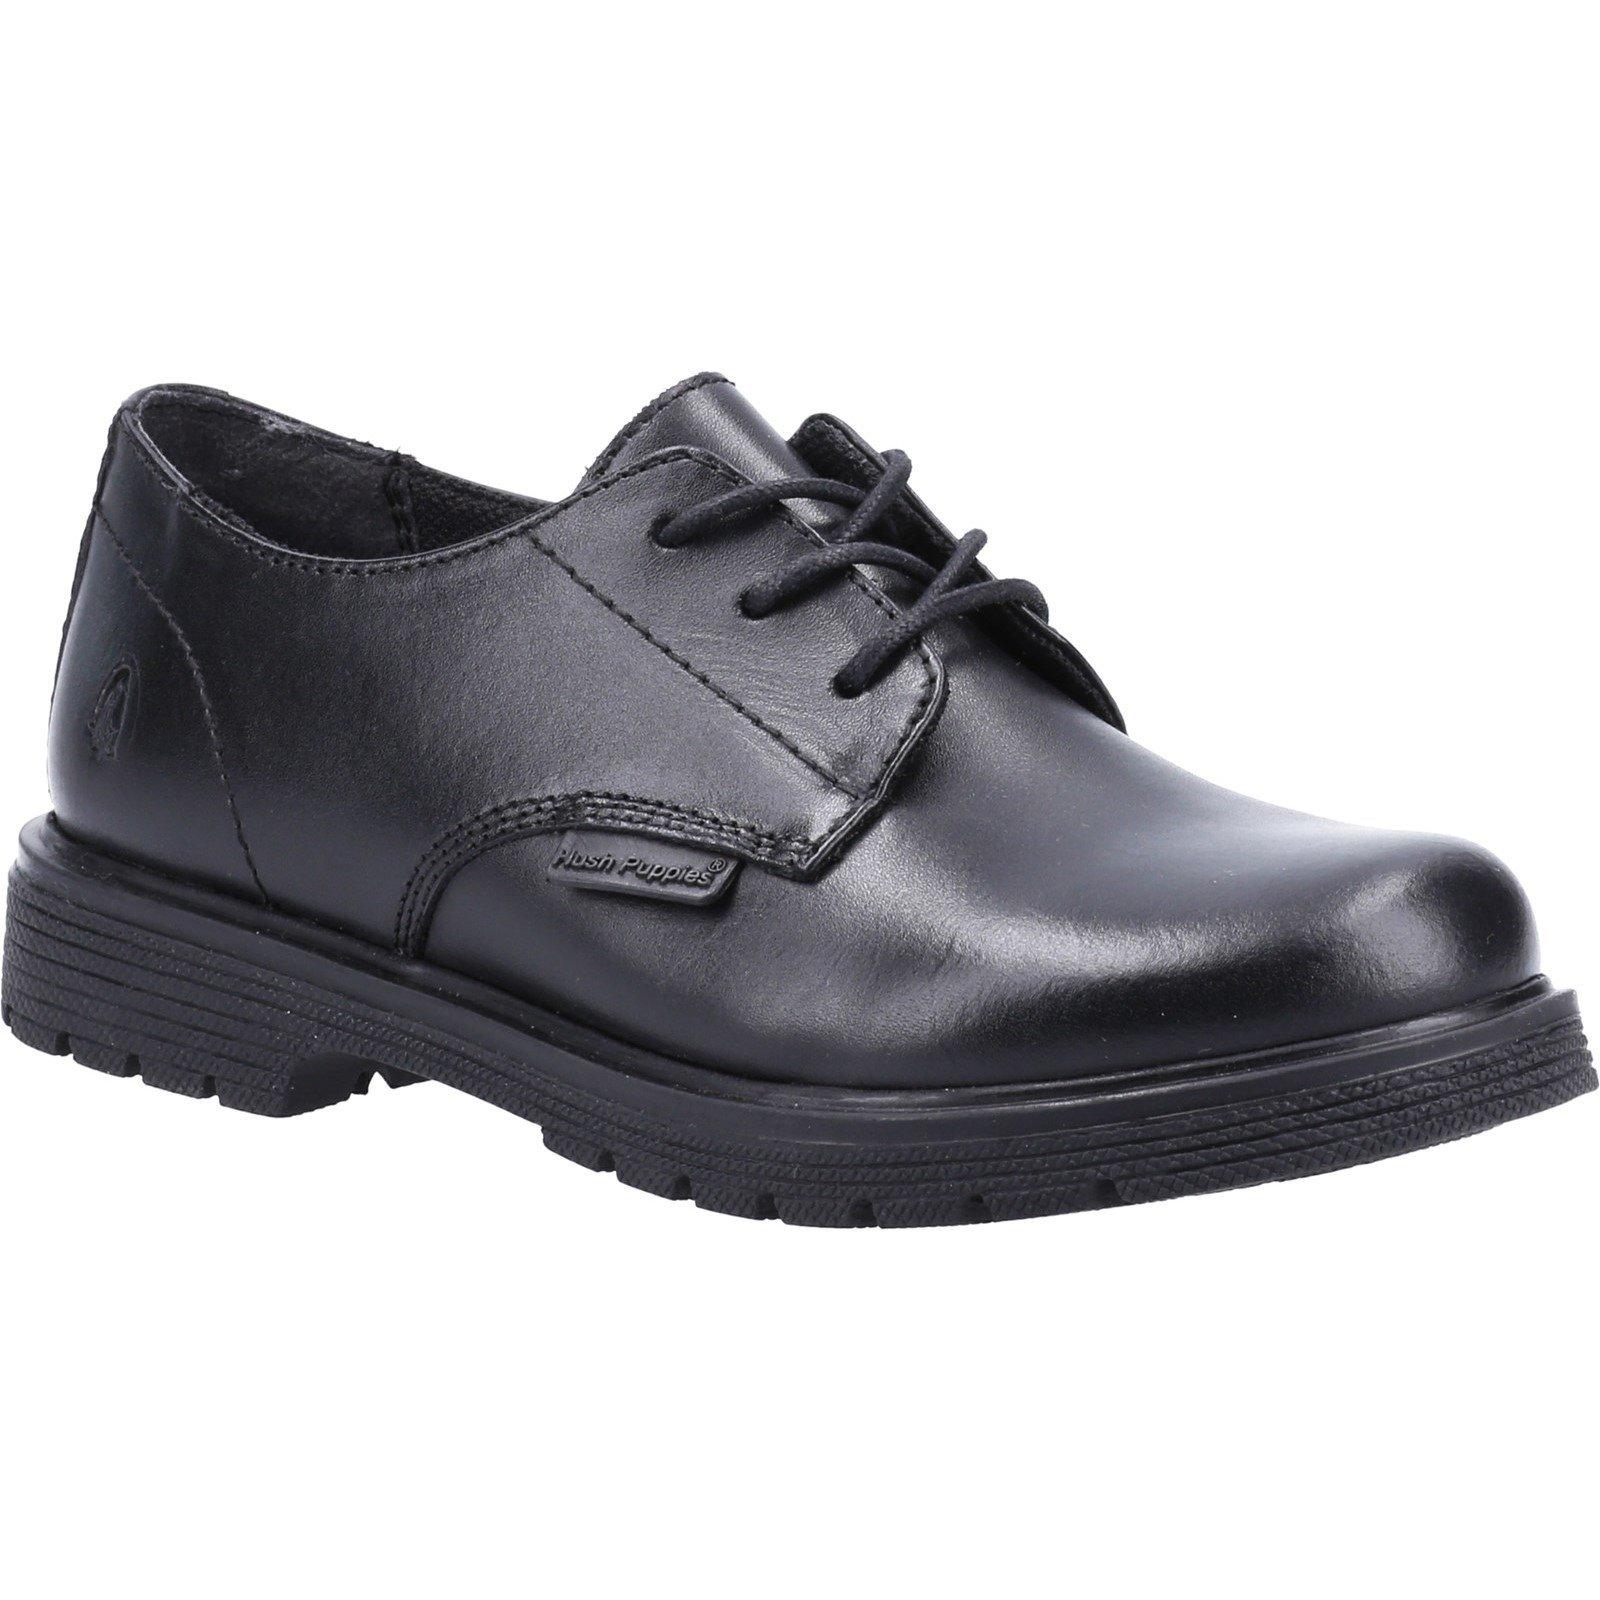 Hush Puppies Kid's Remi Junior School Derby Shoes Black 32612 - Black 10